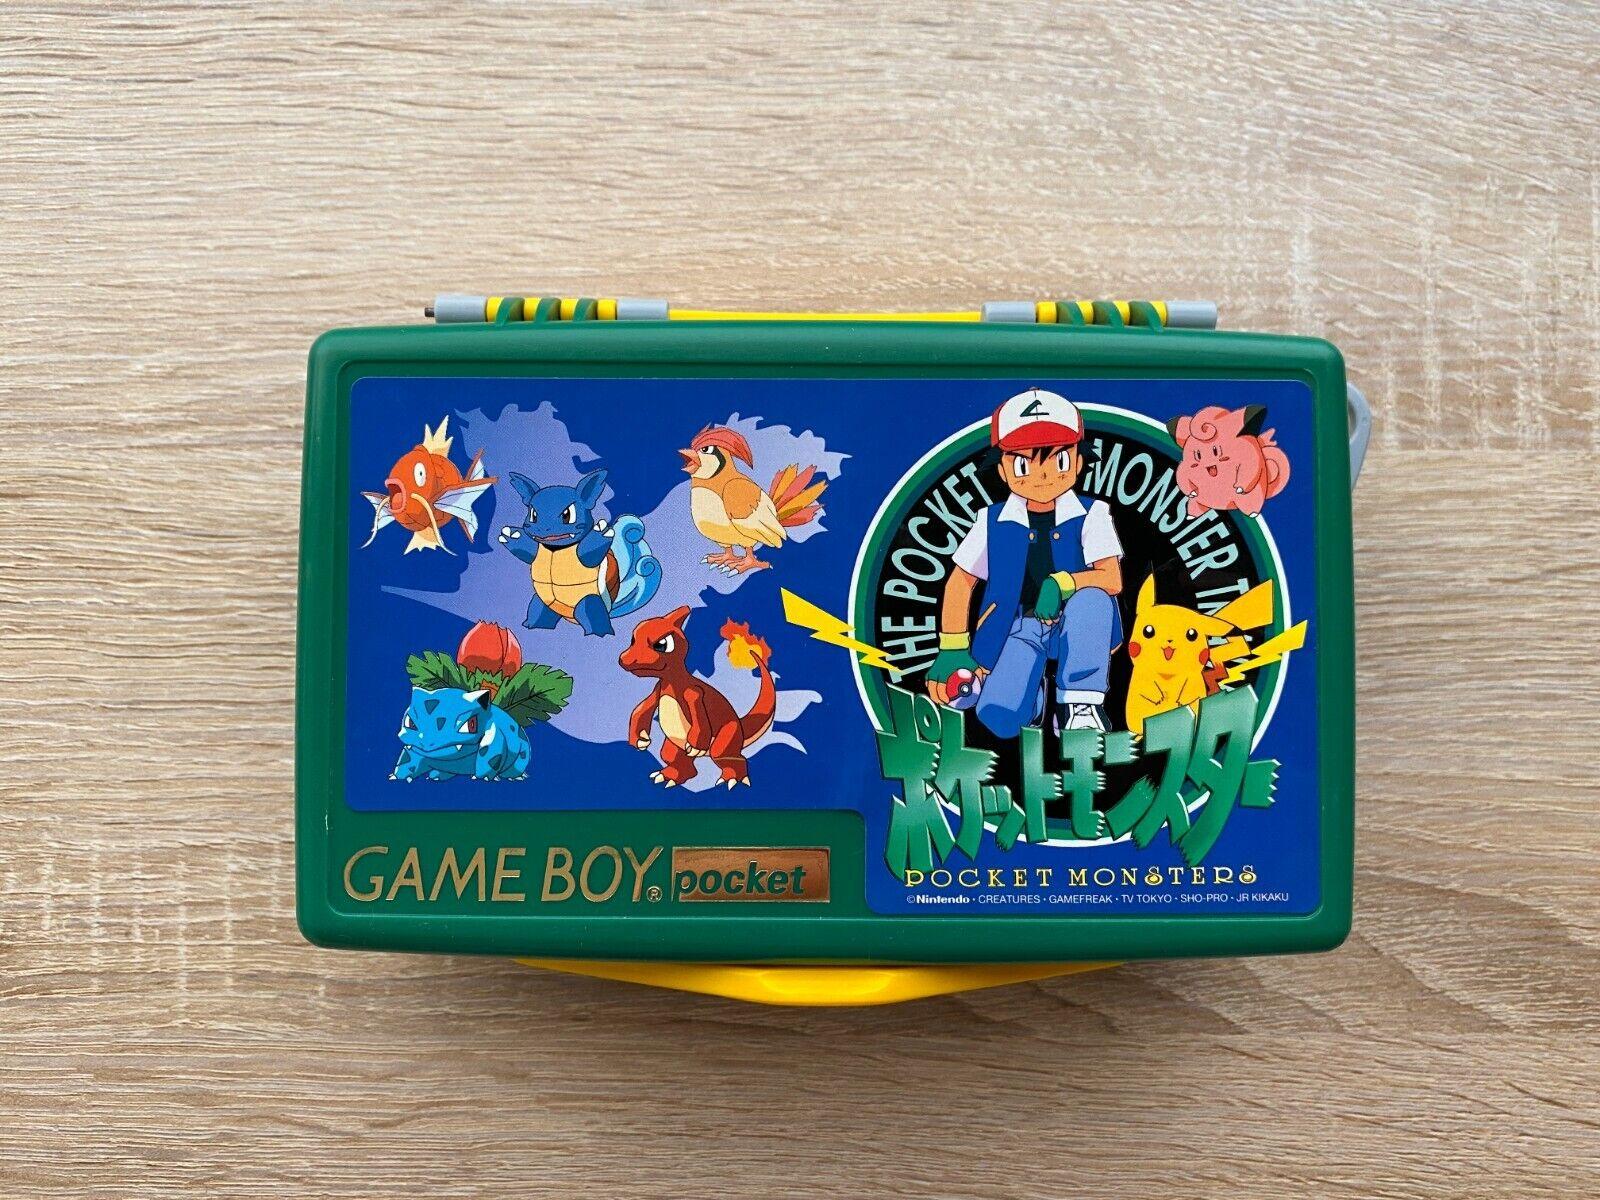 Pokemon / Pocket Monsters Rare Cartridge Carrying Case For Game Boy Pocket